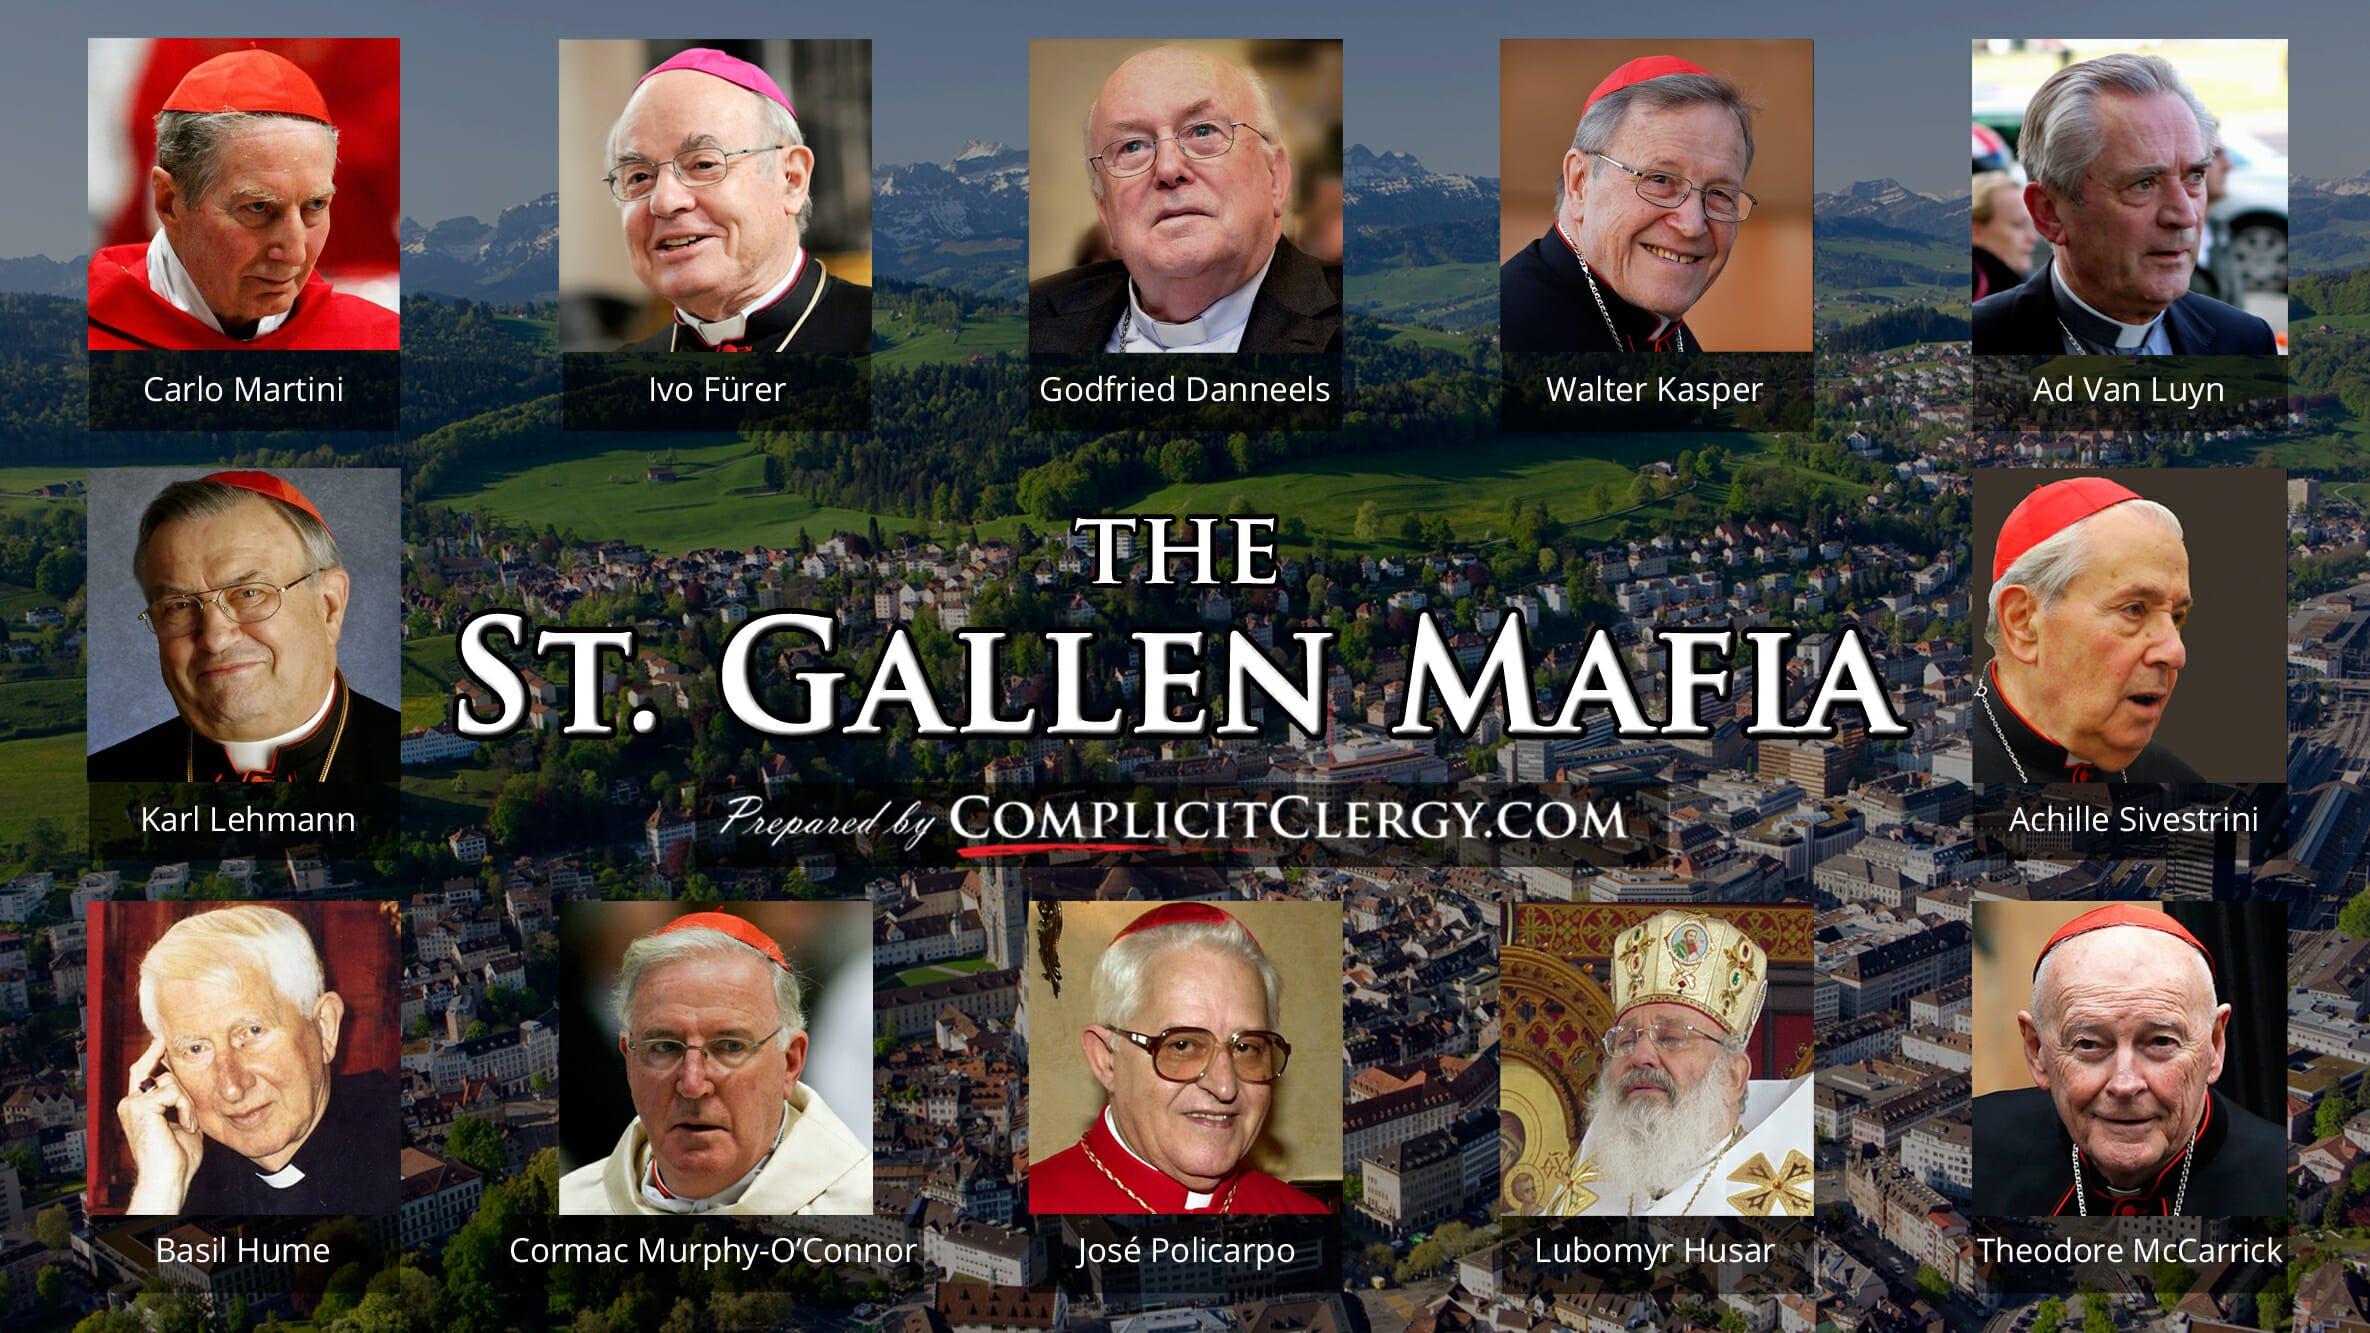 Catholic crime corruption freemasonry heresy contraception politics modernism St. Gallen Luciferiansm Nazi